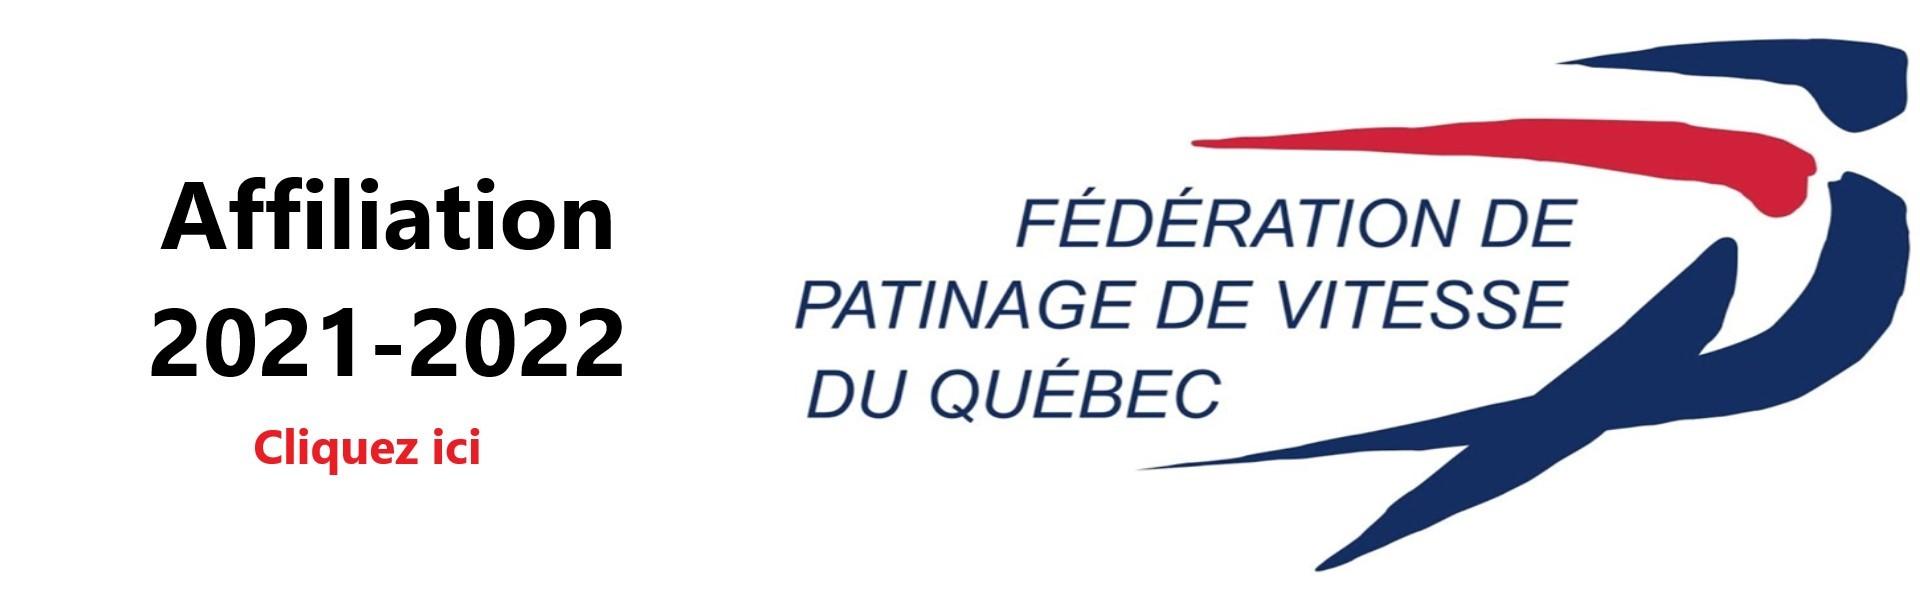 Affiliation 2021-2021 FPVQ